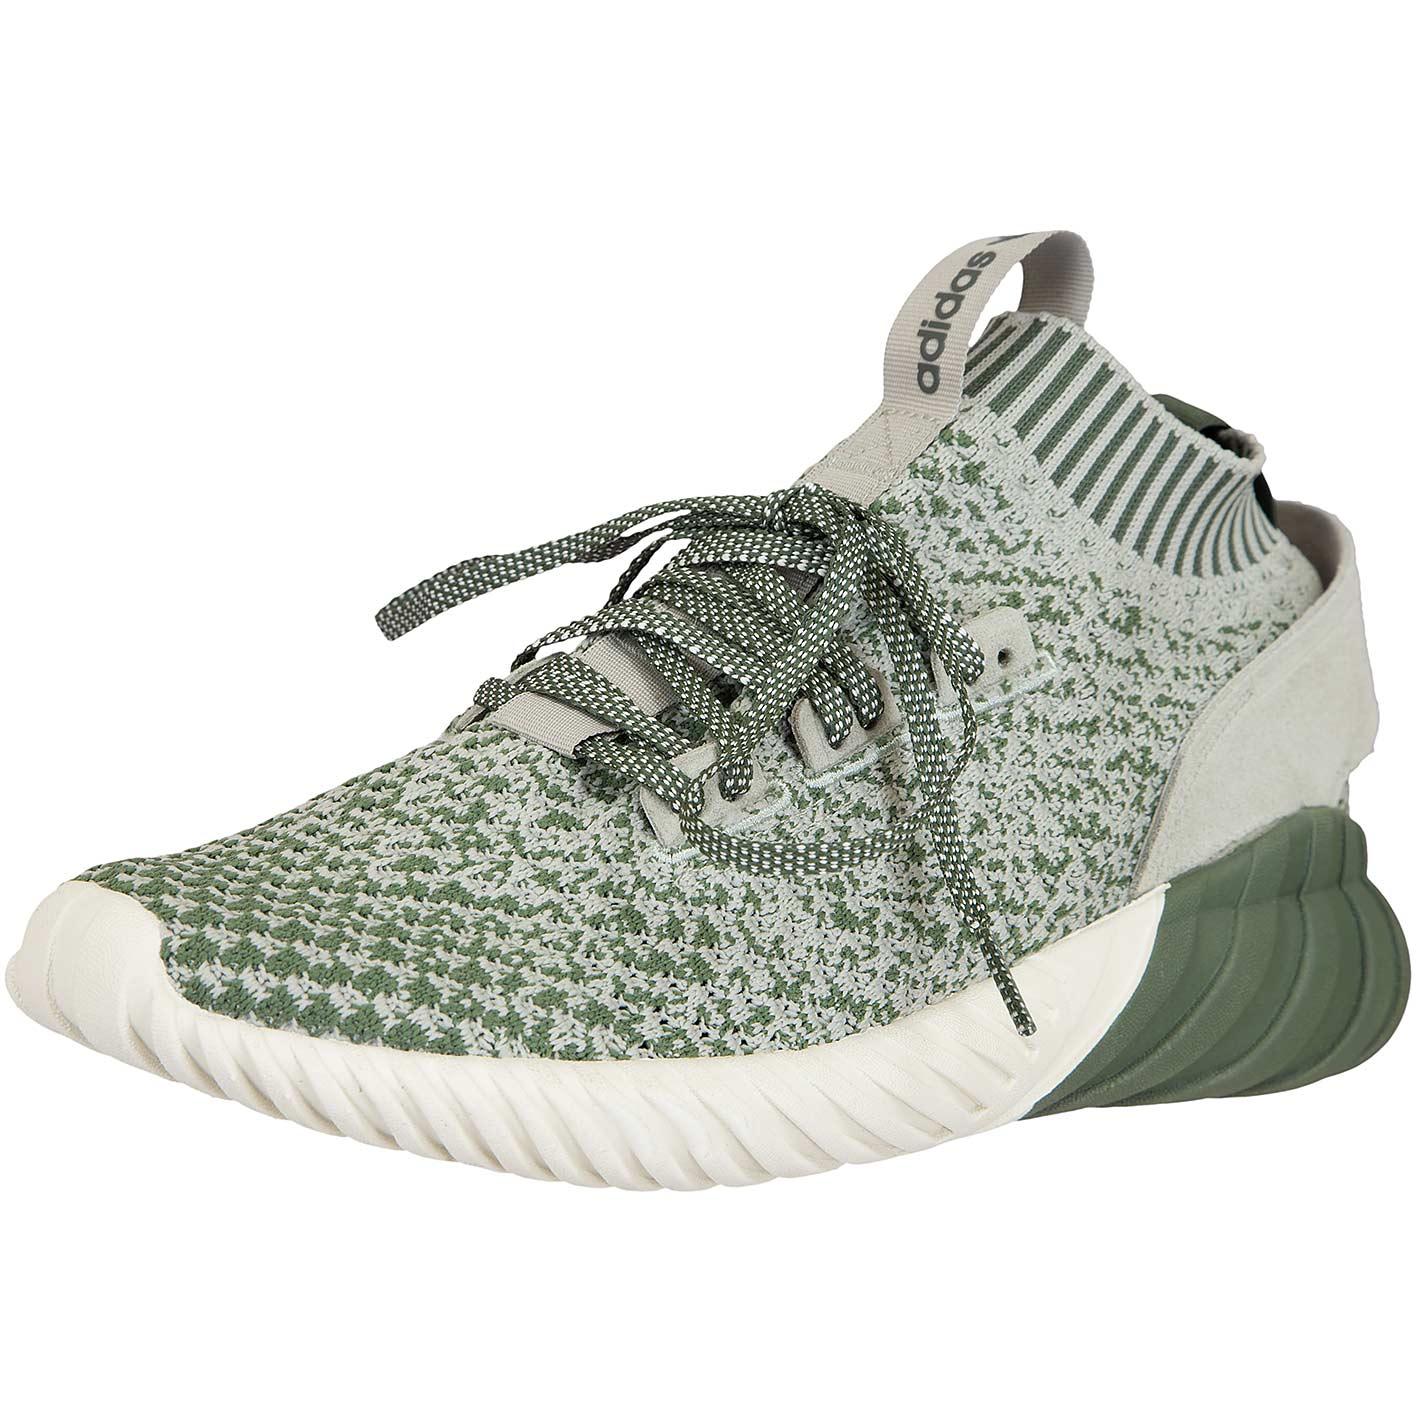 Sneaker Tubular Doom Grüngrau Sock Adidas Originals 8ZXN0PkwnO